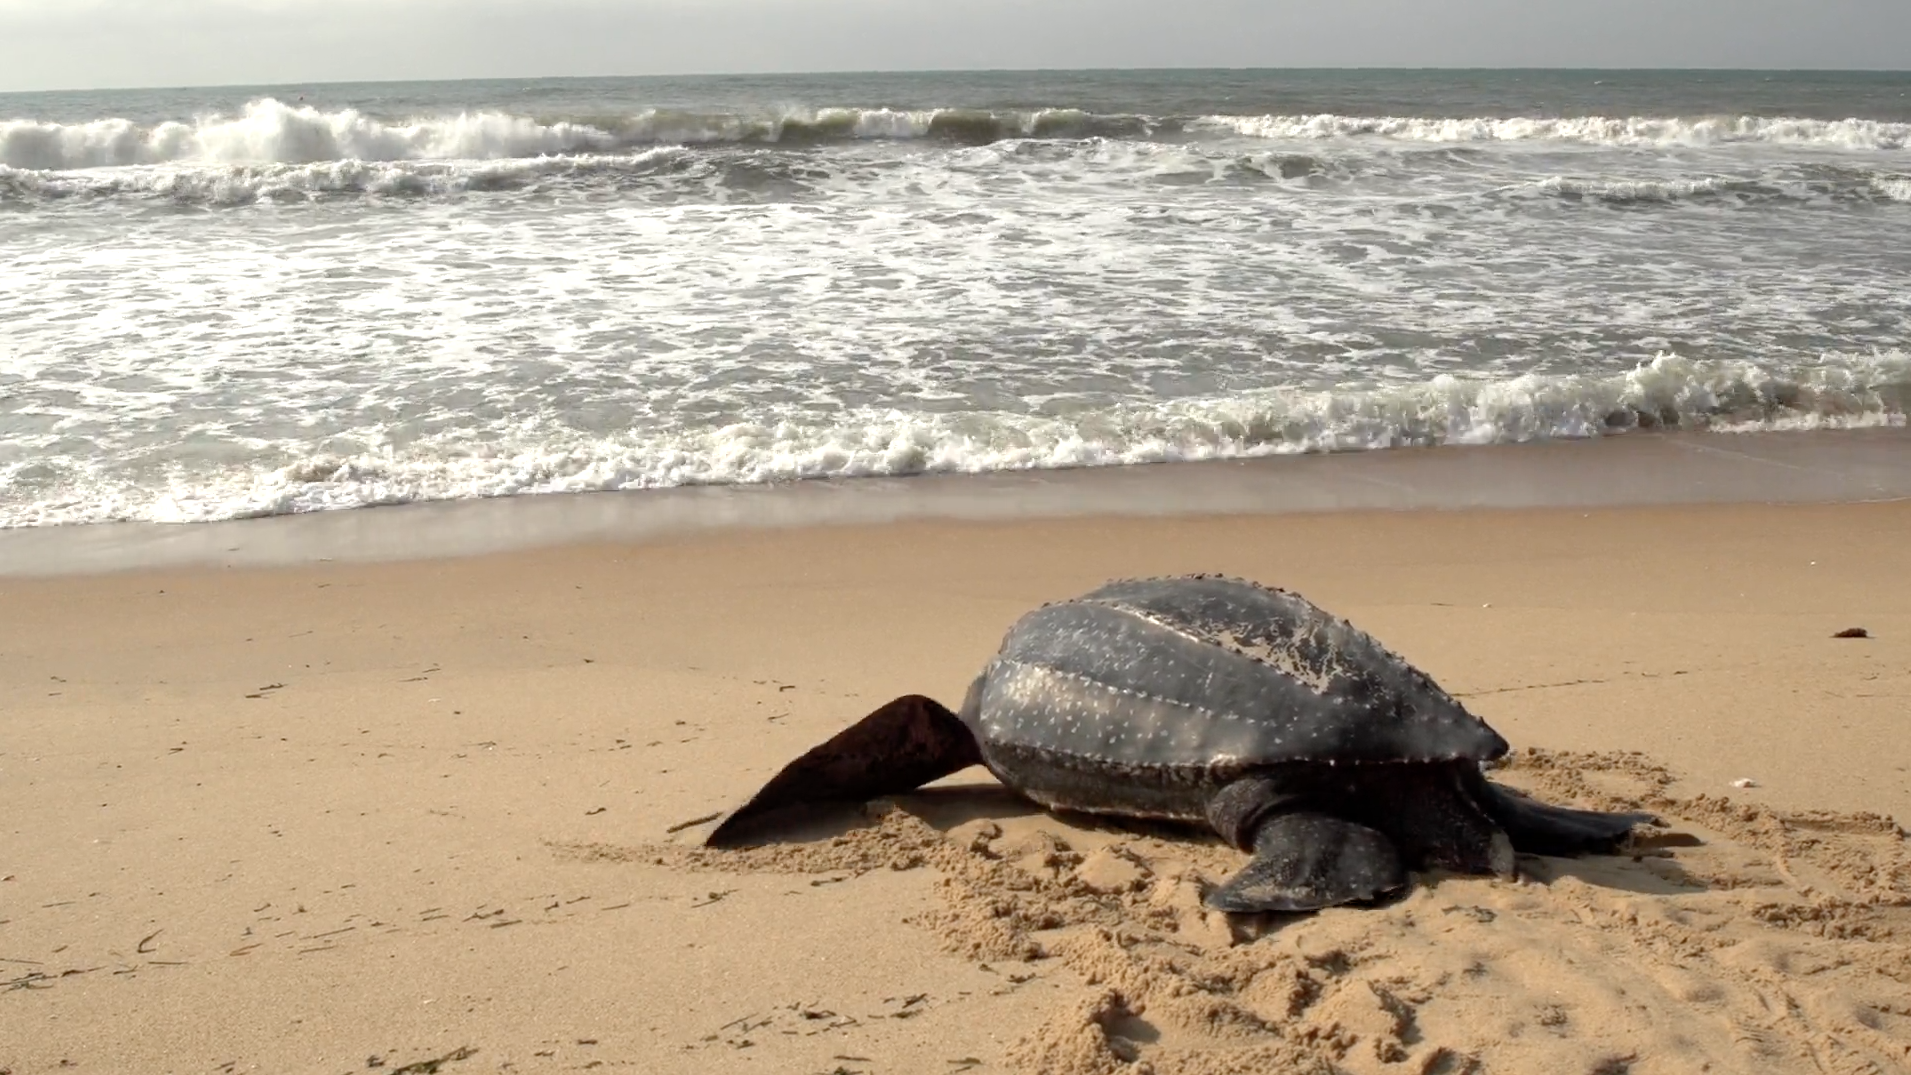 Protecting Turtles in Liberia